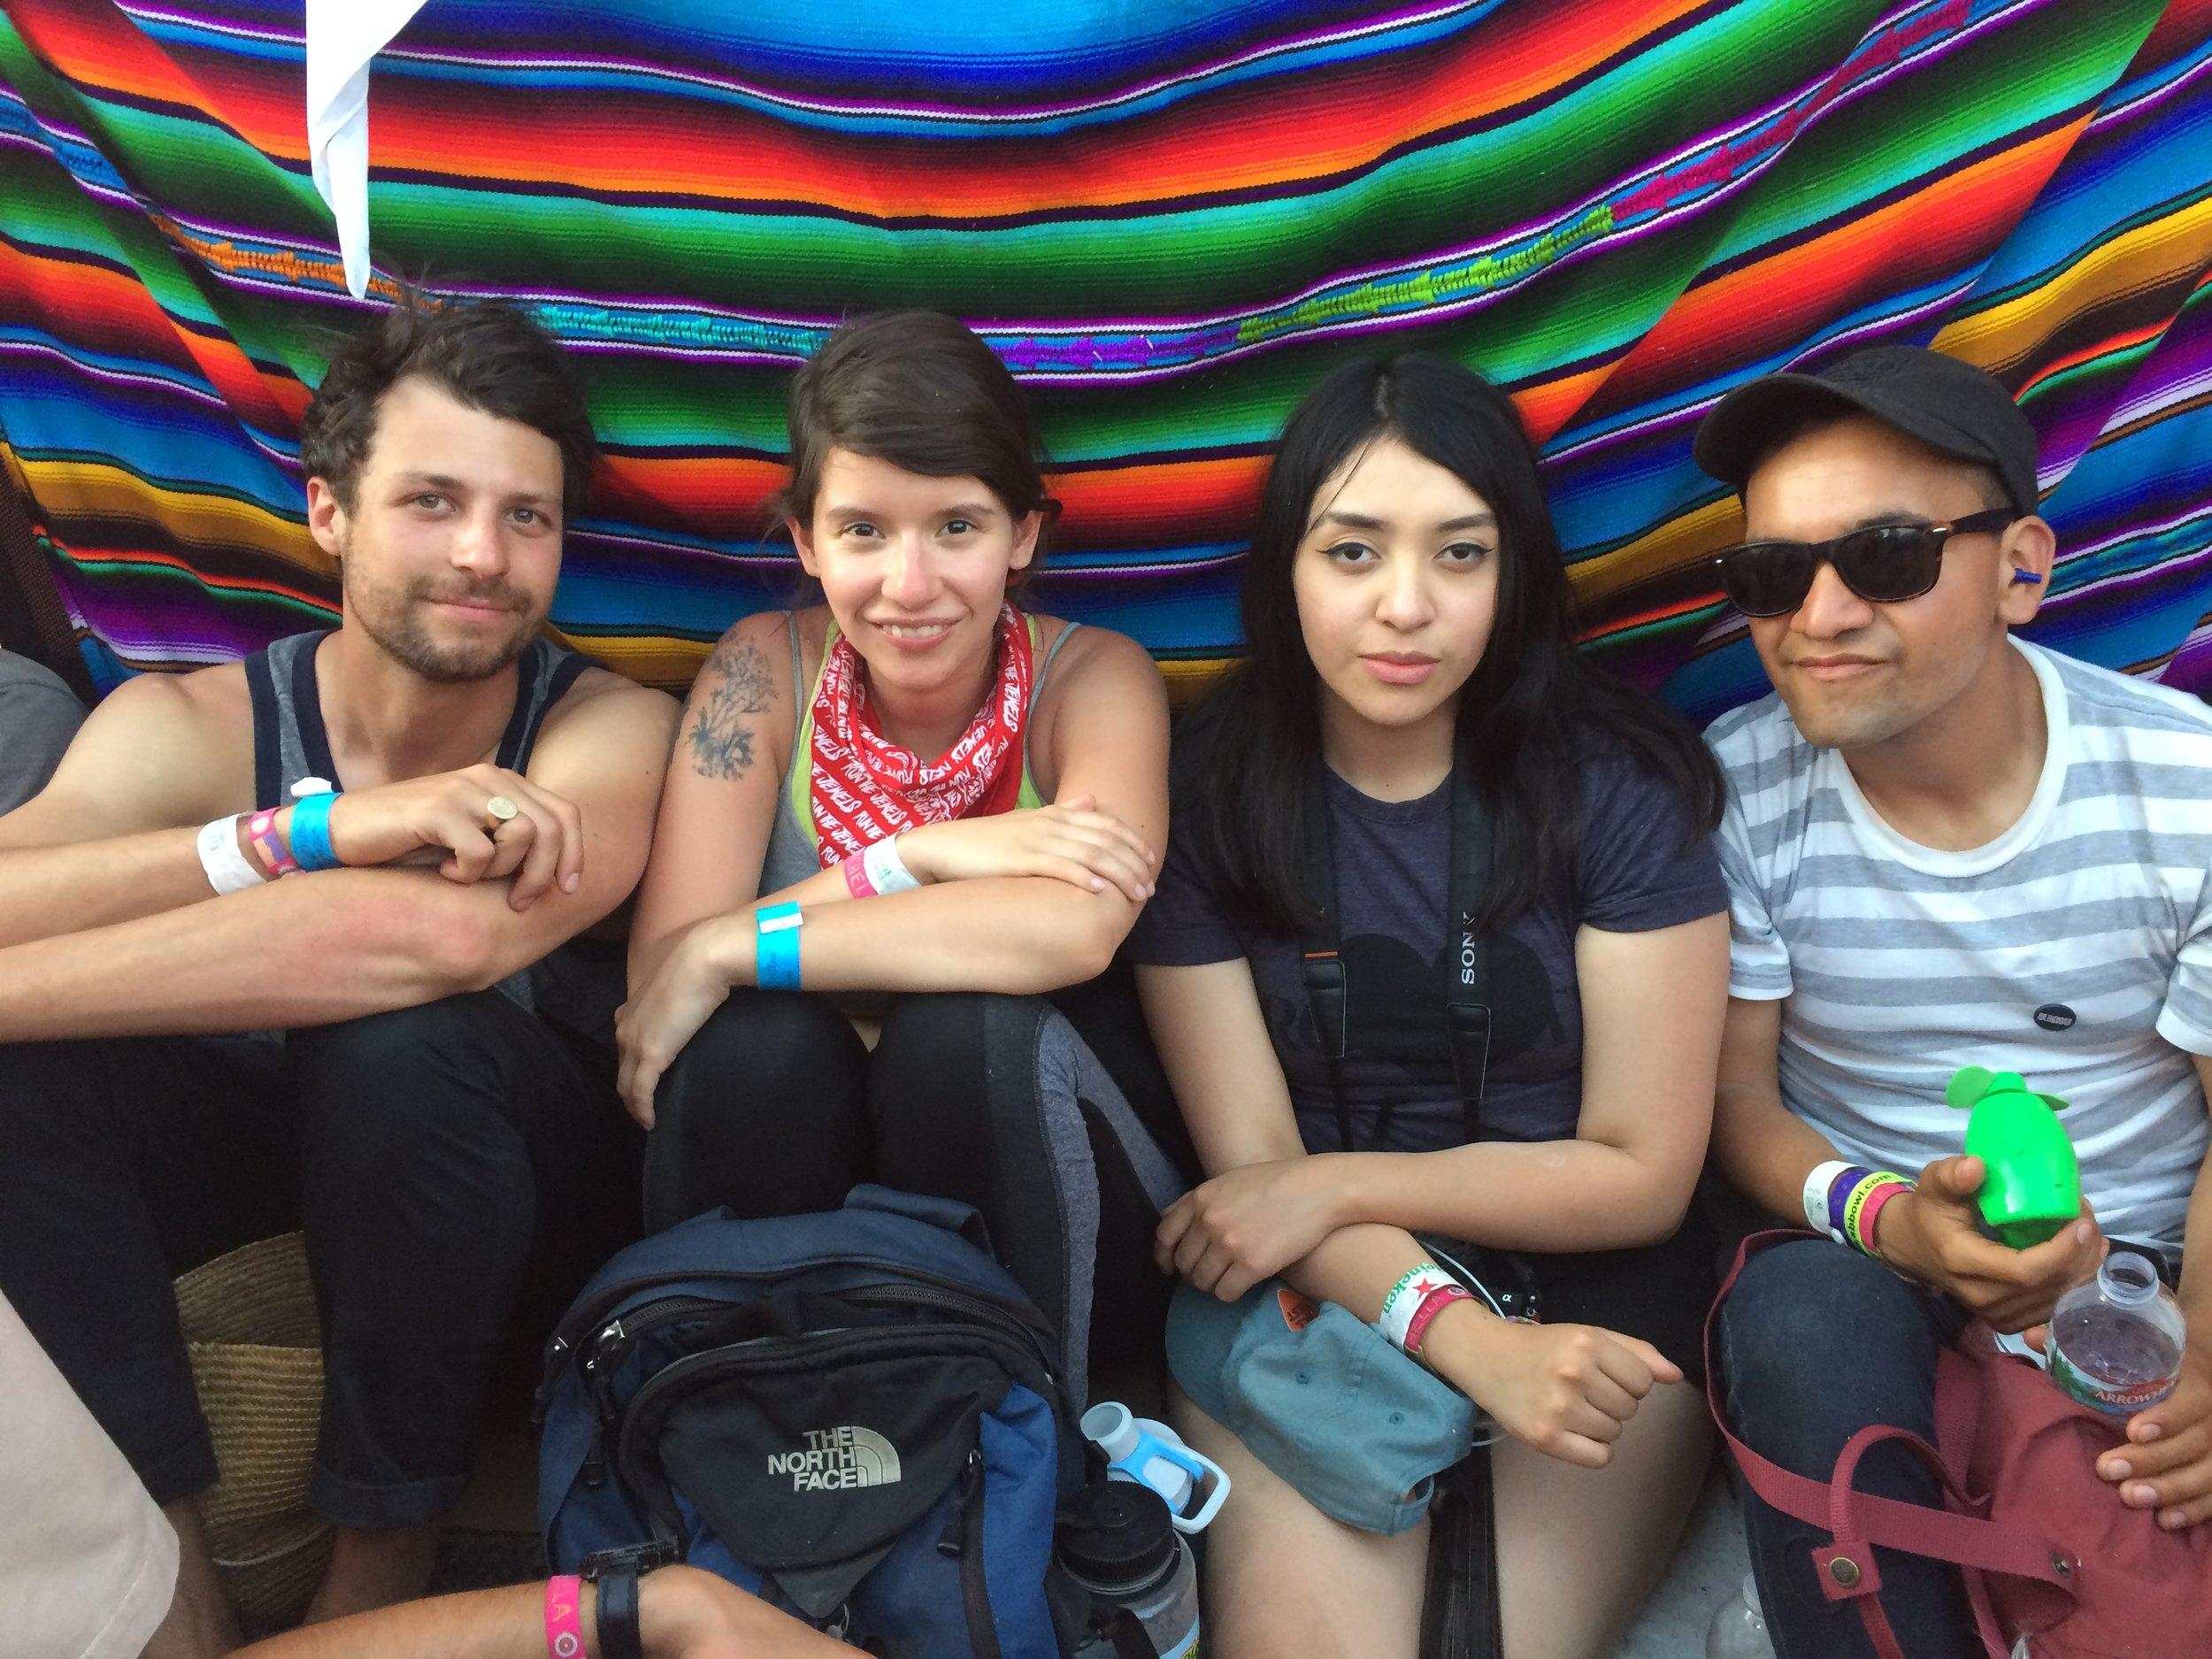 Coachella, Indio - April 20